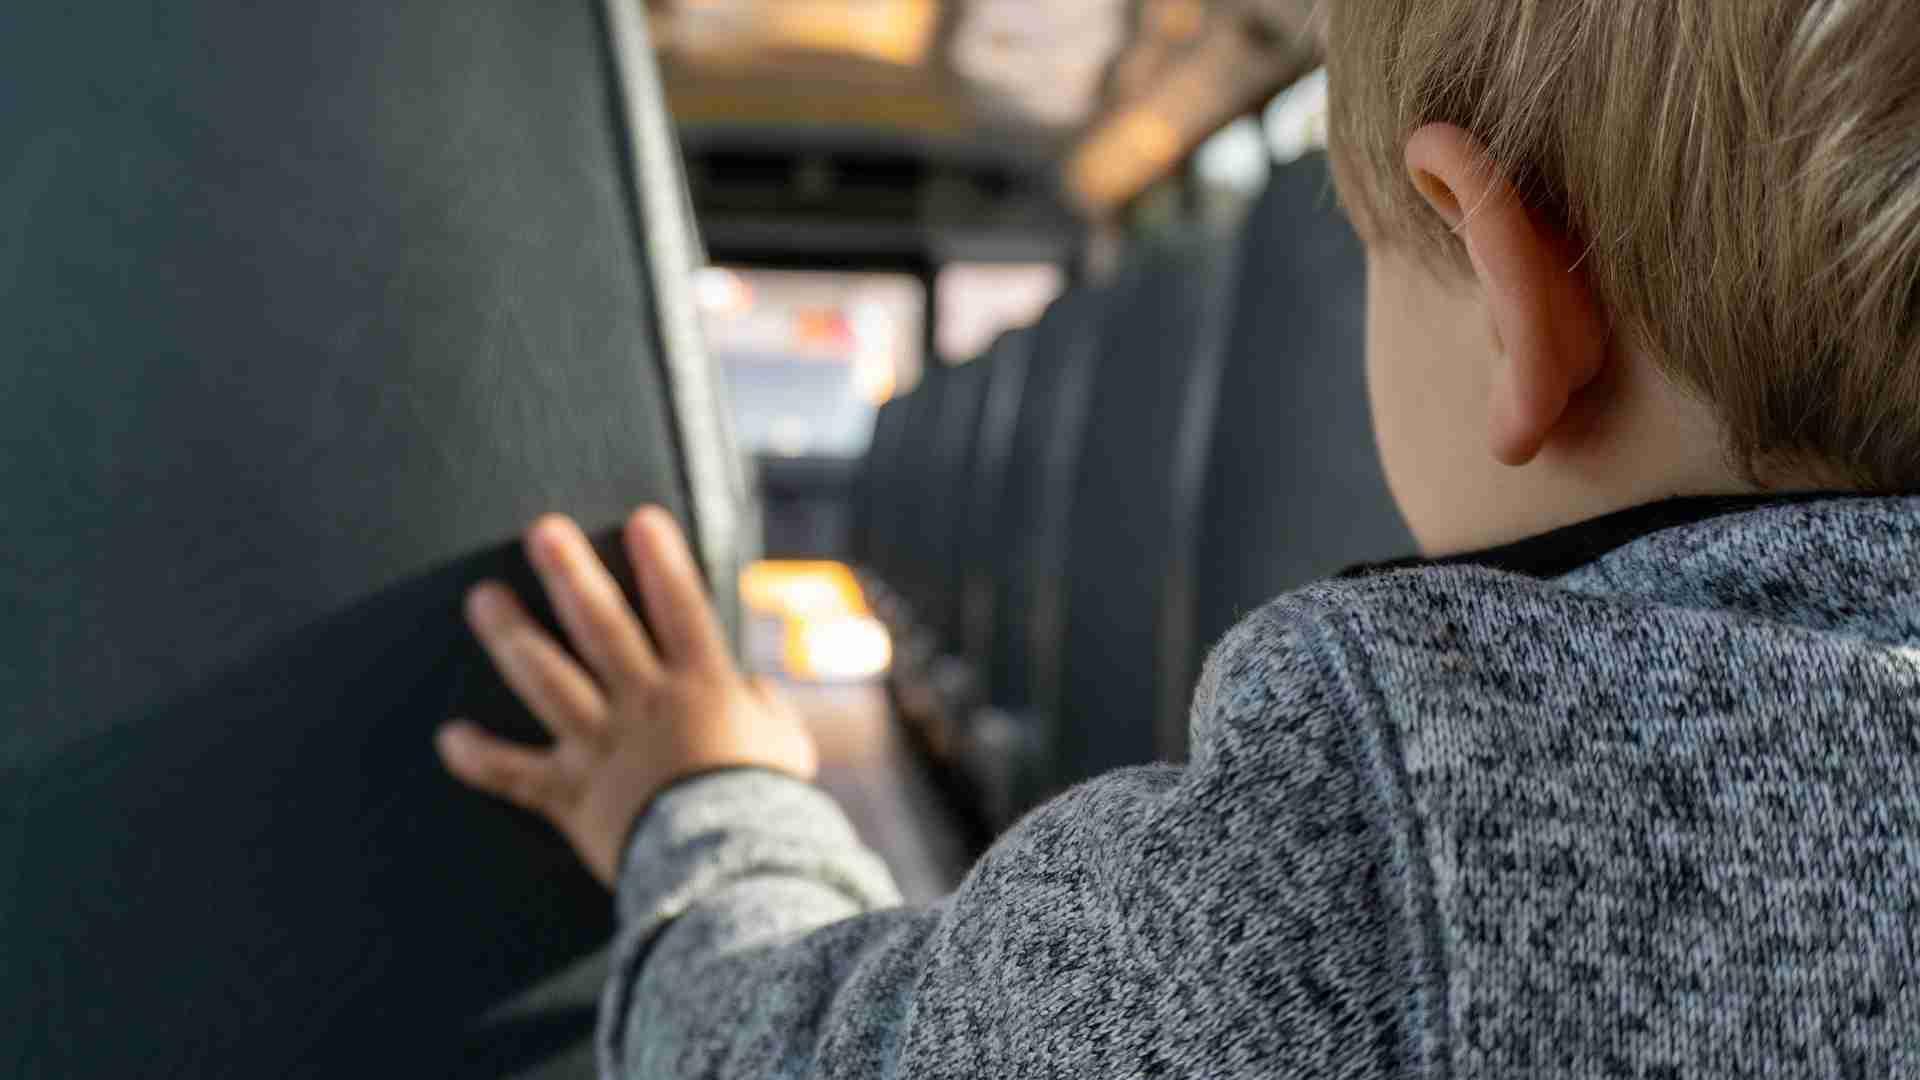 Child on a school bus